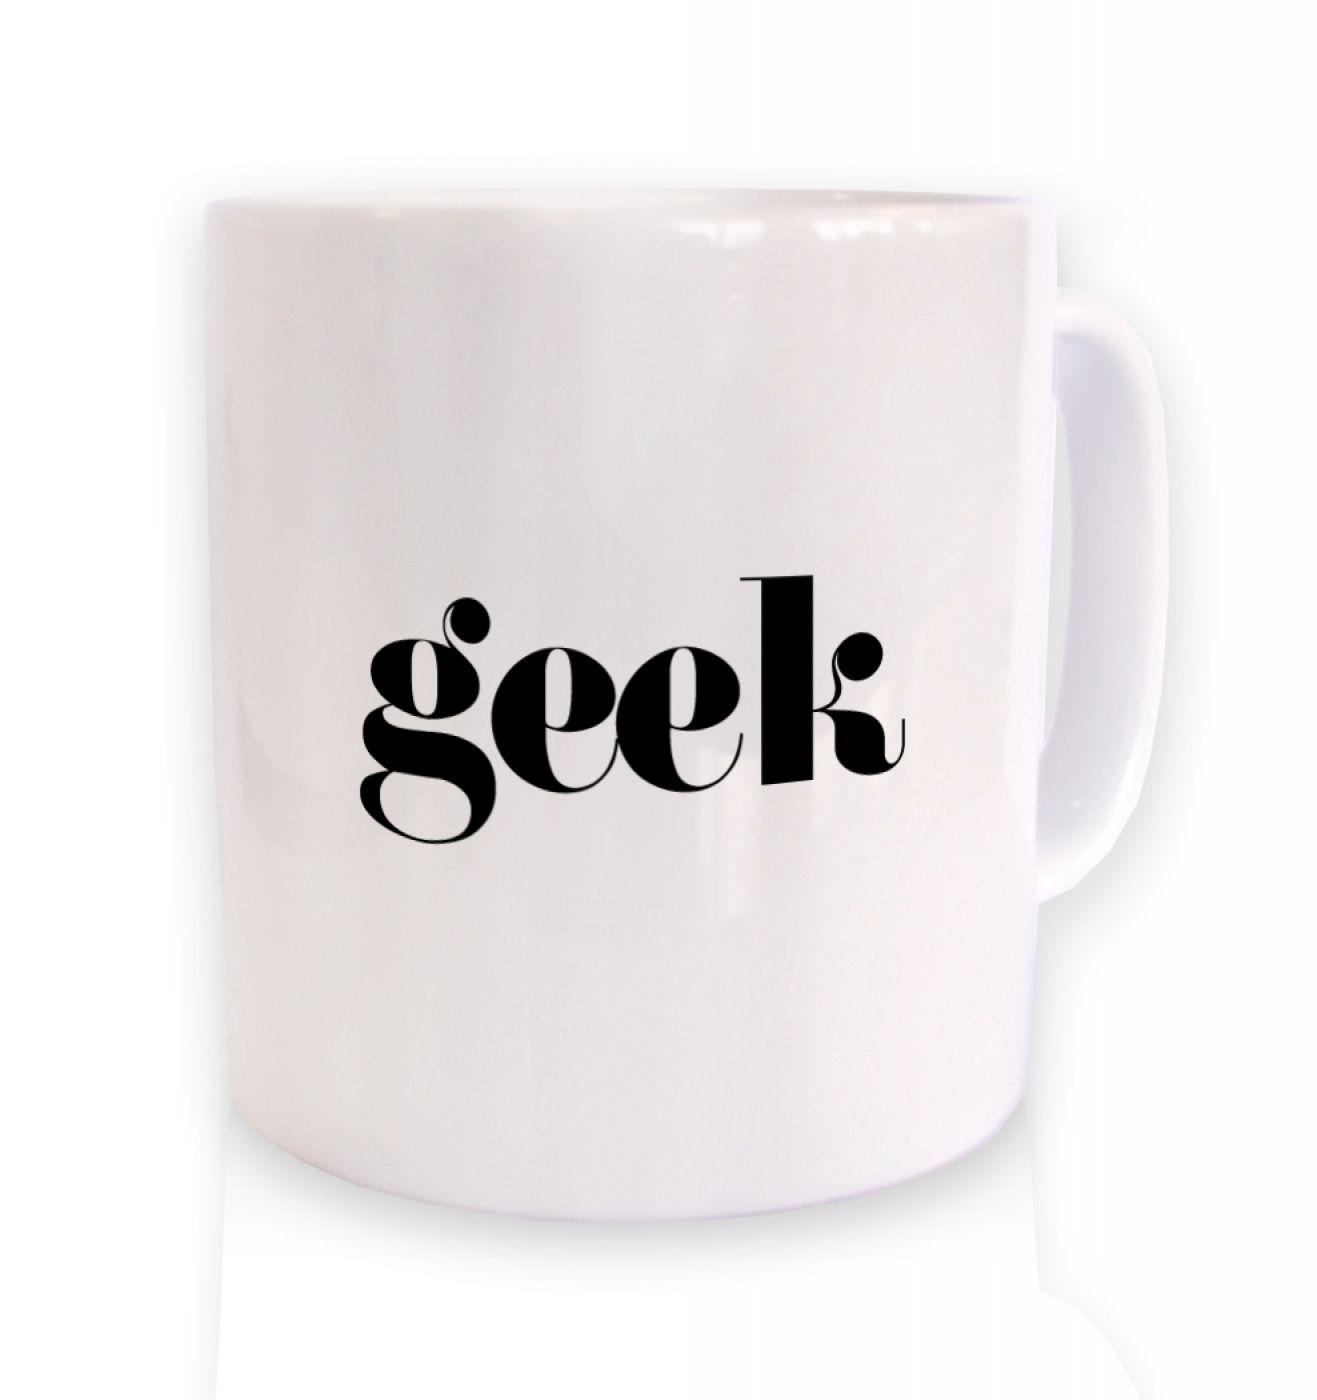 Geek ceramic coffee mug